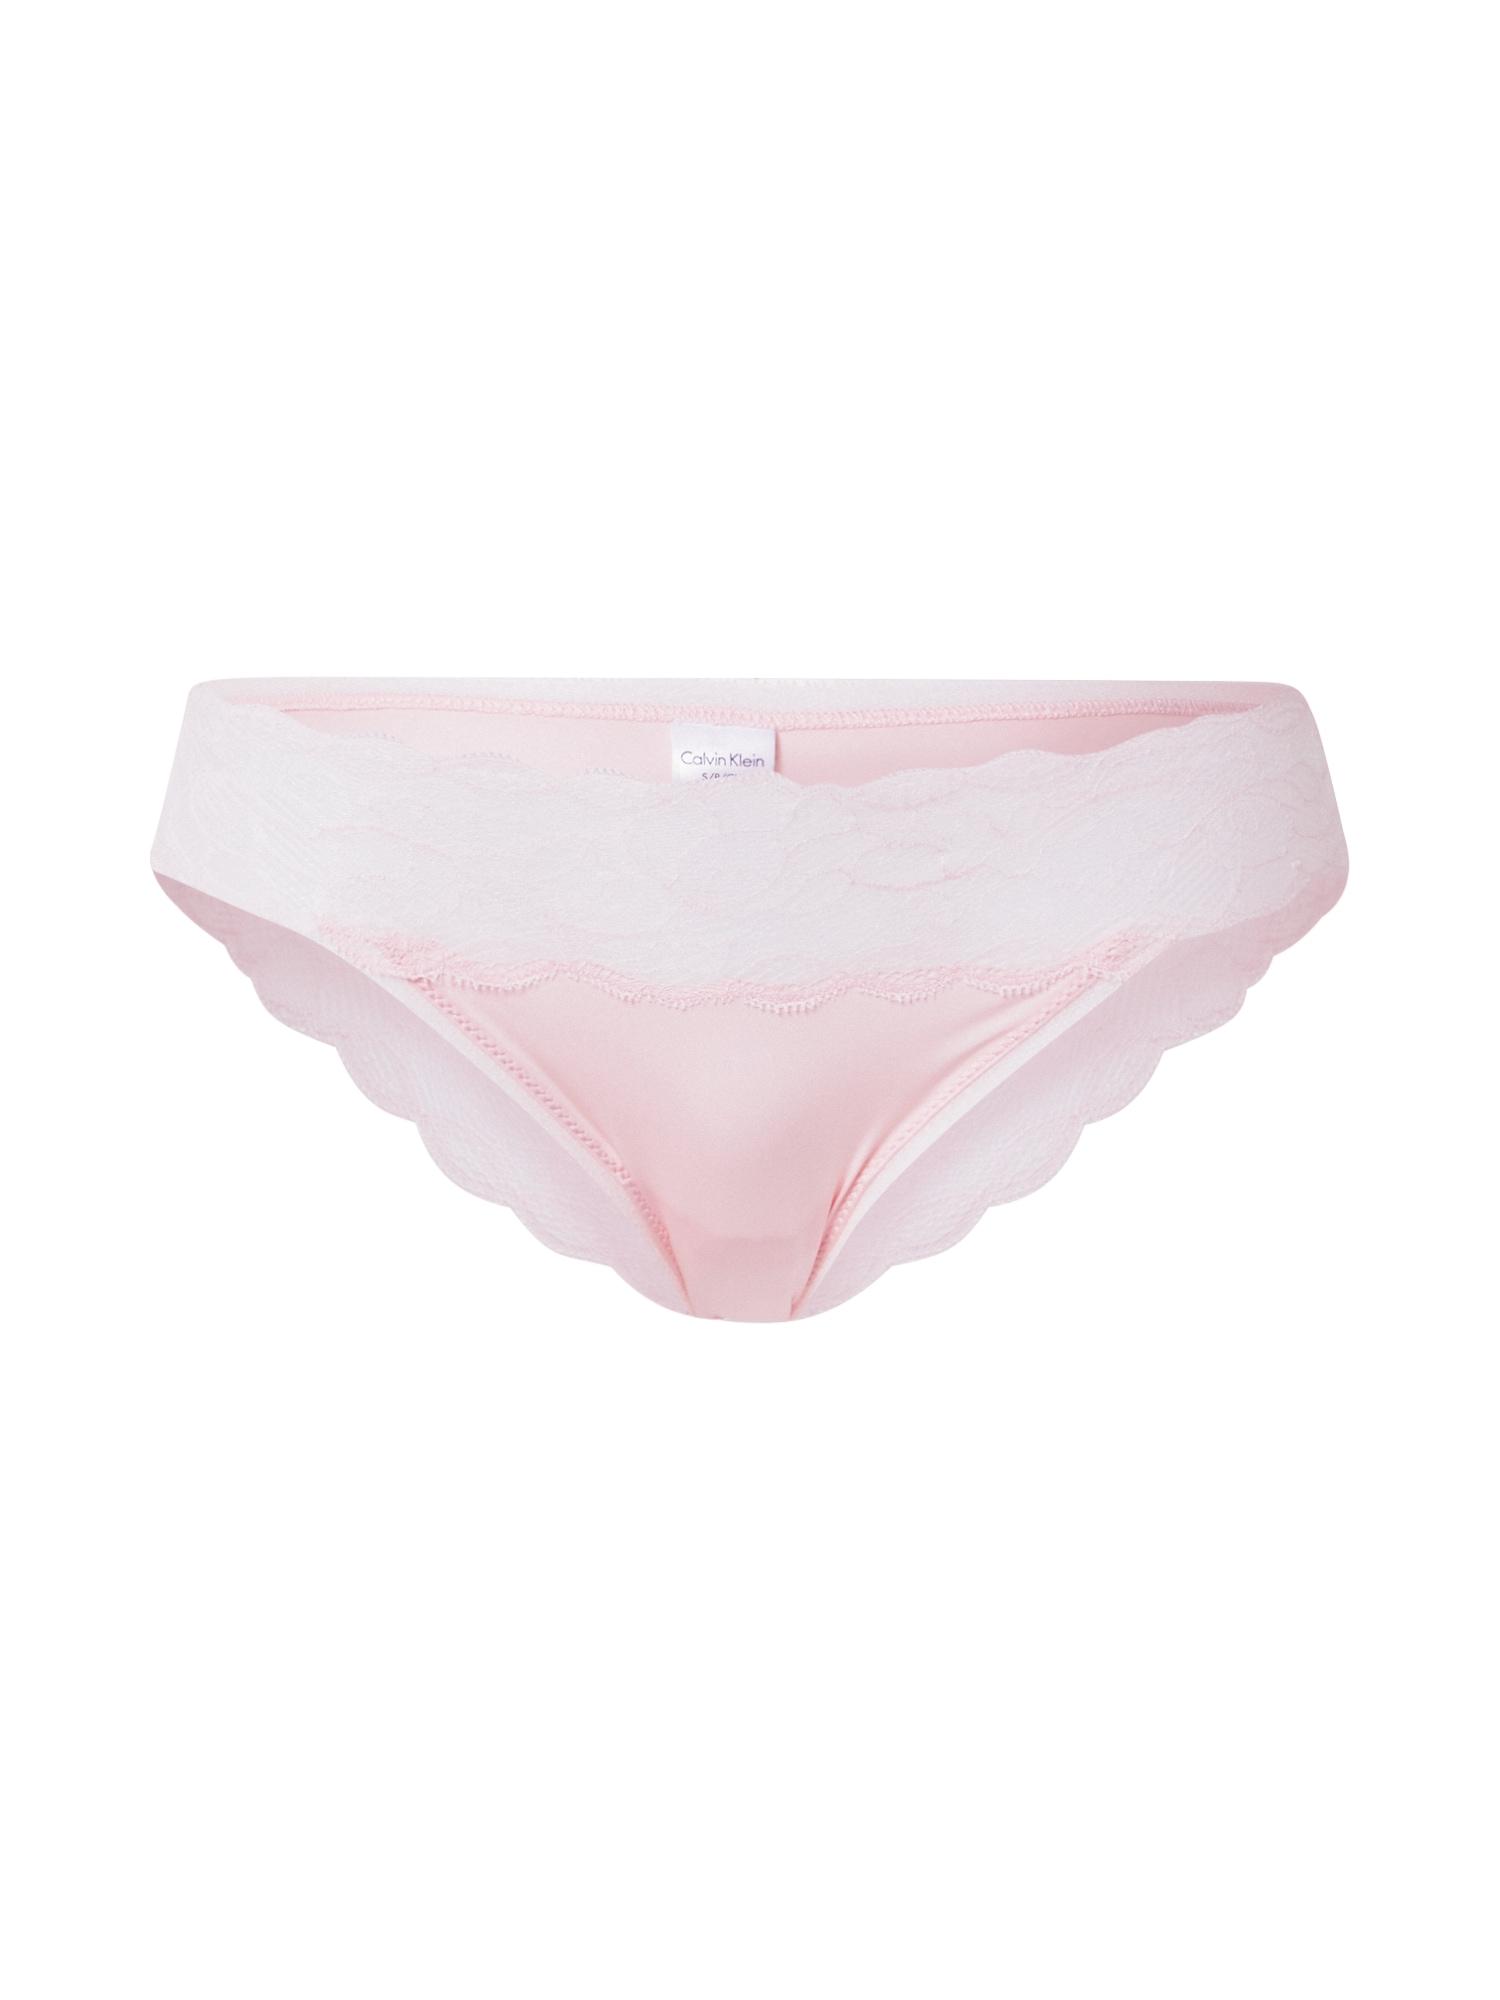 Calvin Klein Underwear Moteriškos kelnaitės rožinė